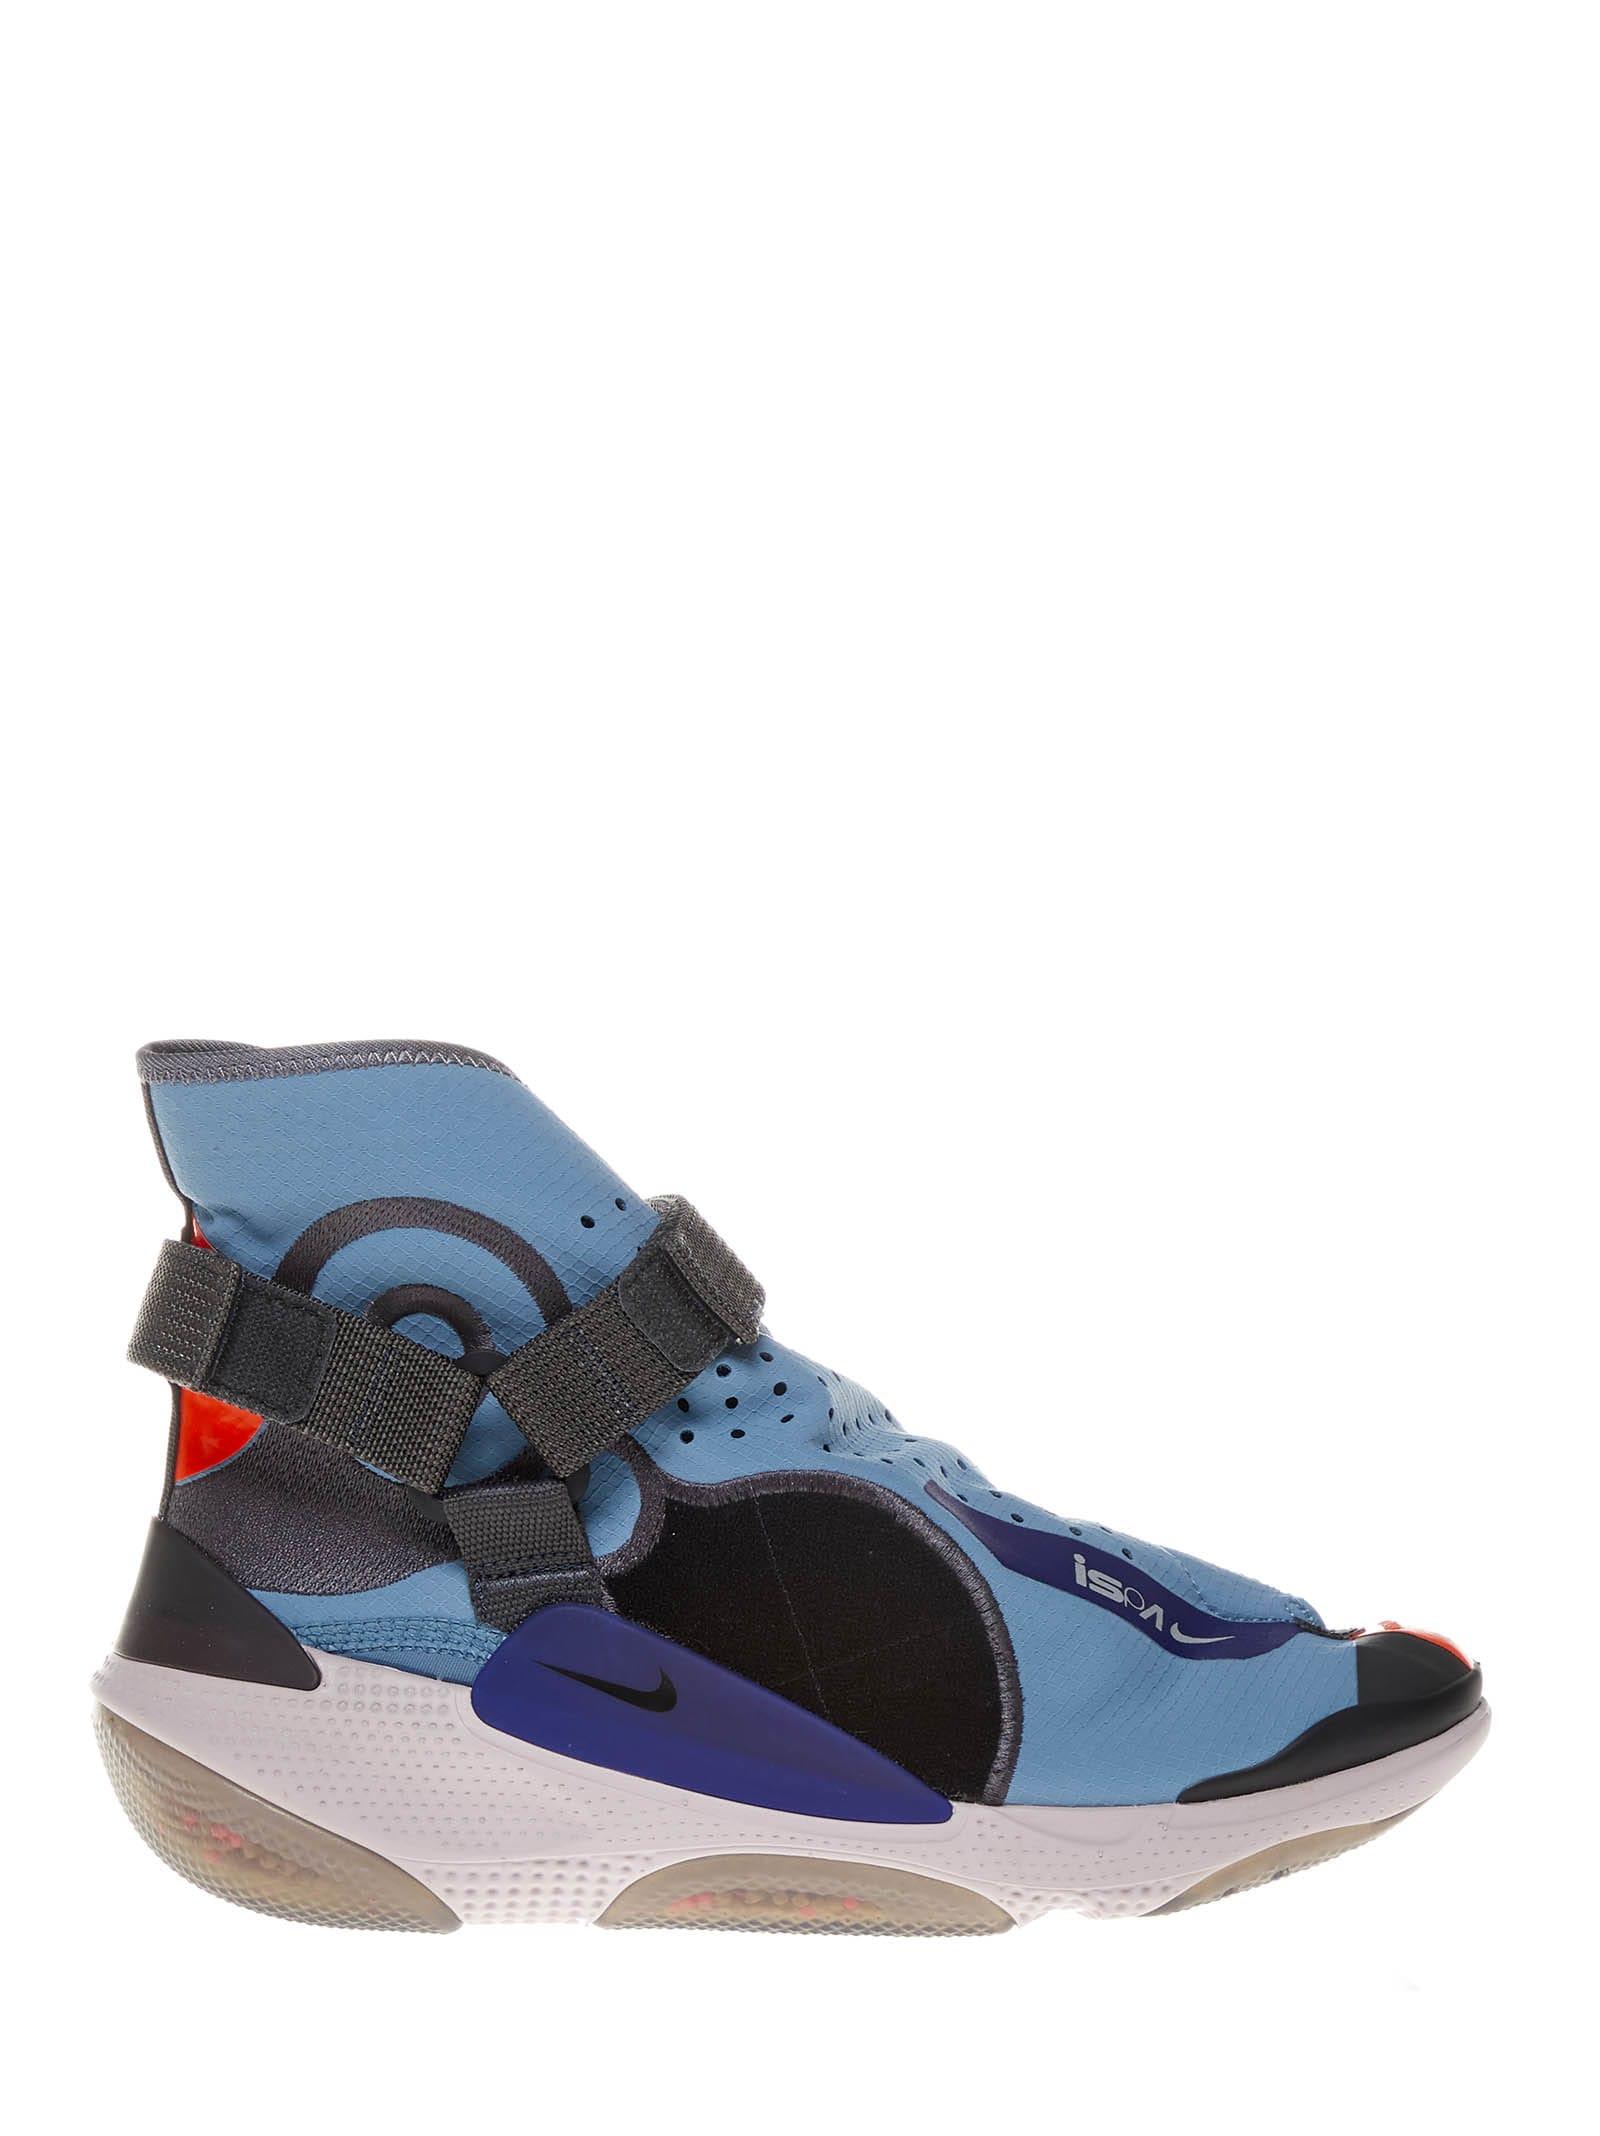 Nike Joyride Env Ispa Sneakers